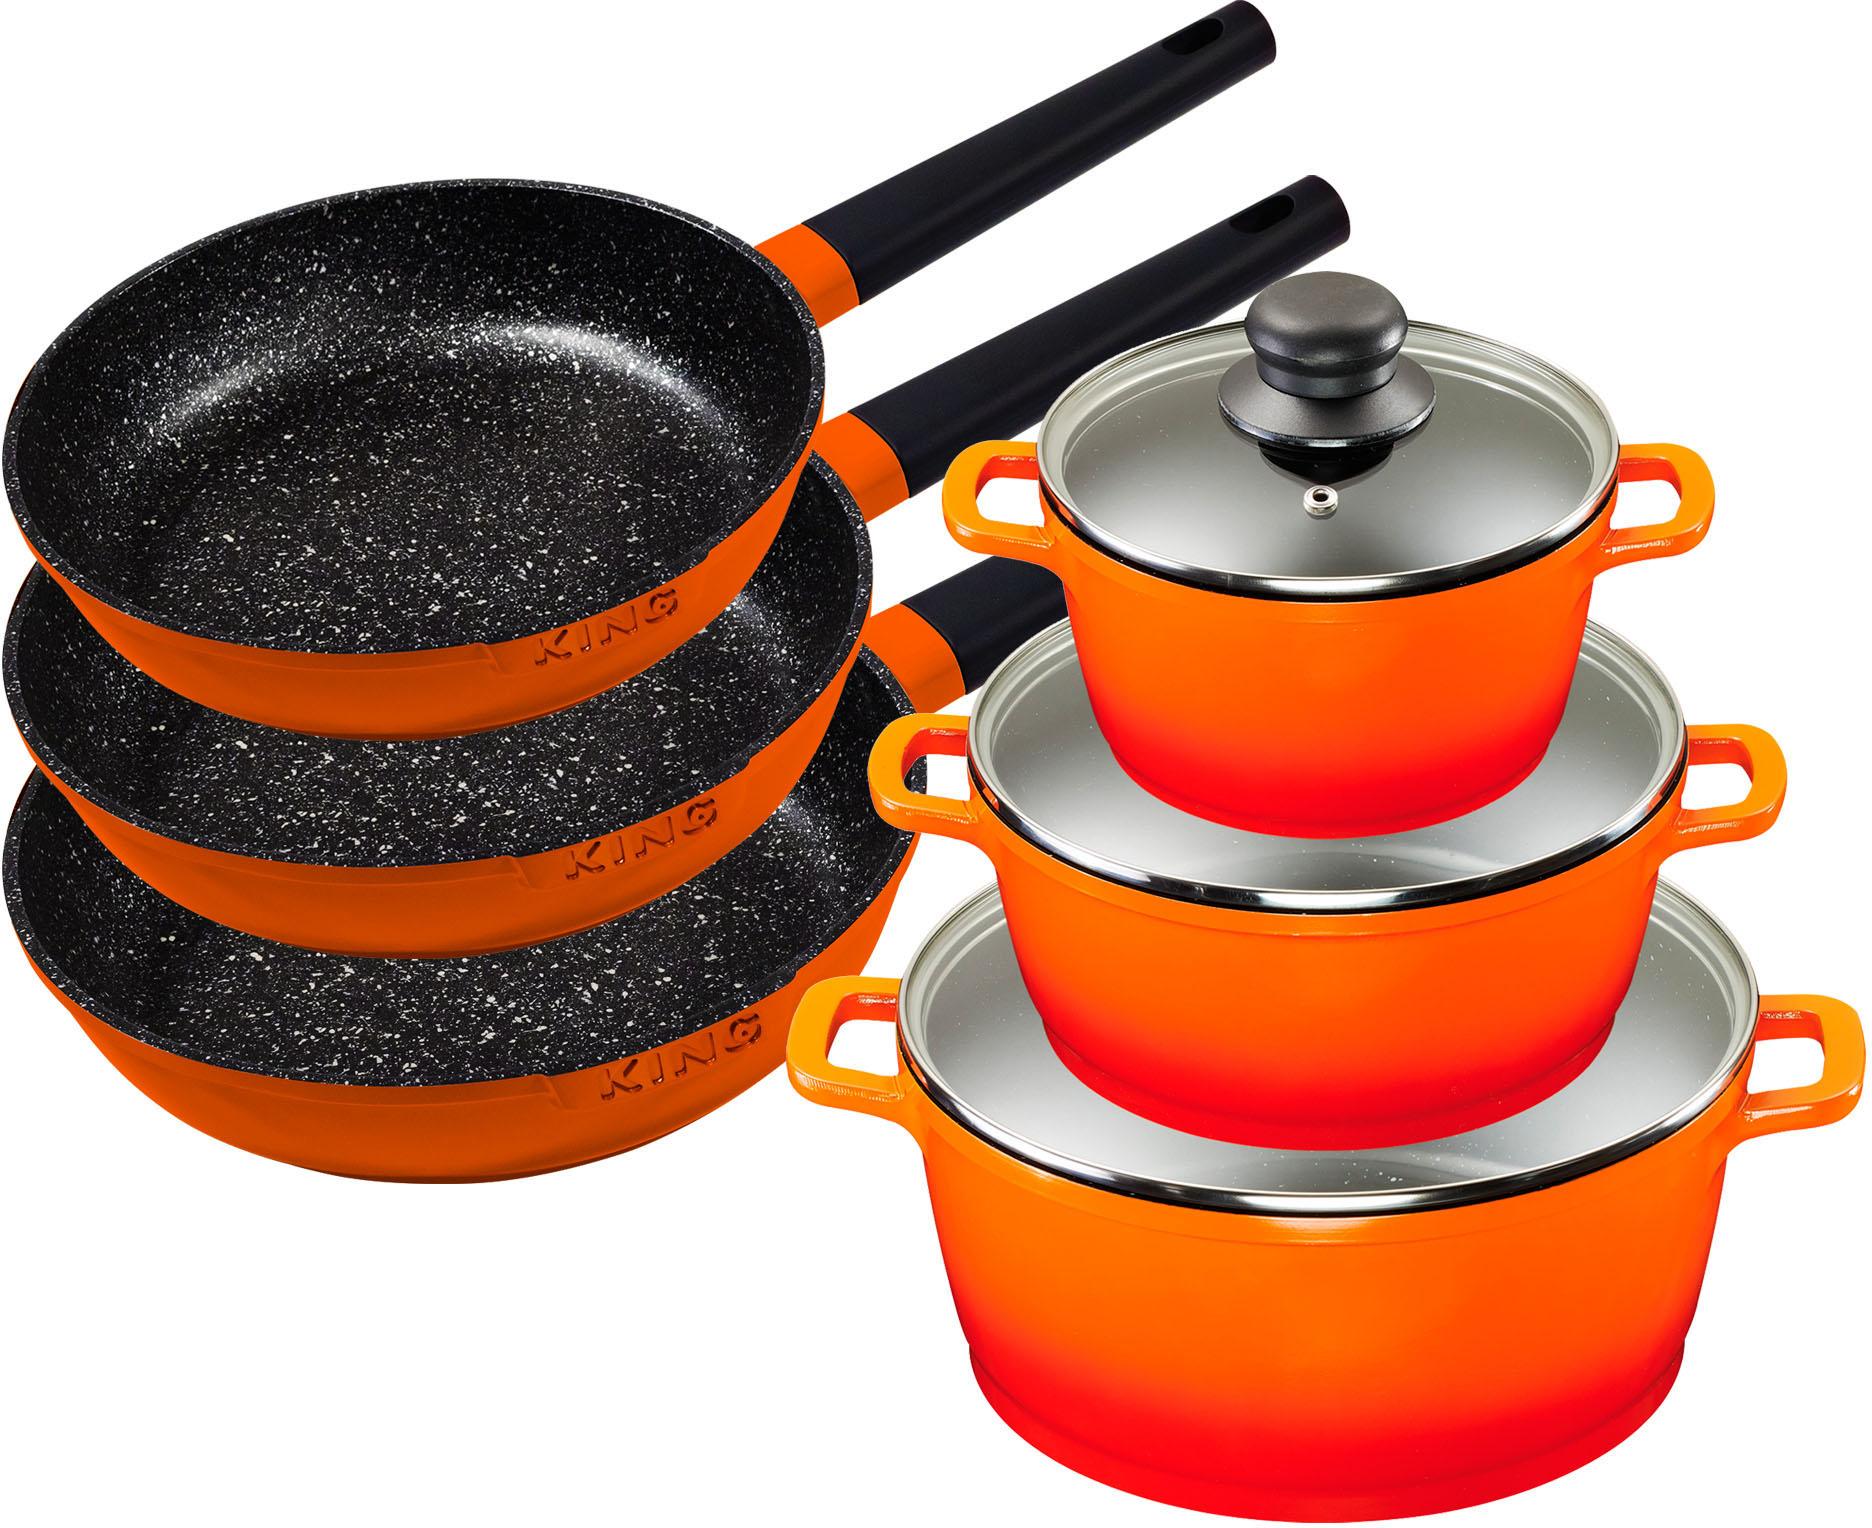 KING Topf-Set Shine Orange, Aluminiumguss, (Set, 9 tlg., 3 Pfannen, Töpfe, Deckel), Induktion orange Topfsets Töpfe Haushaltswaren